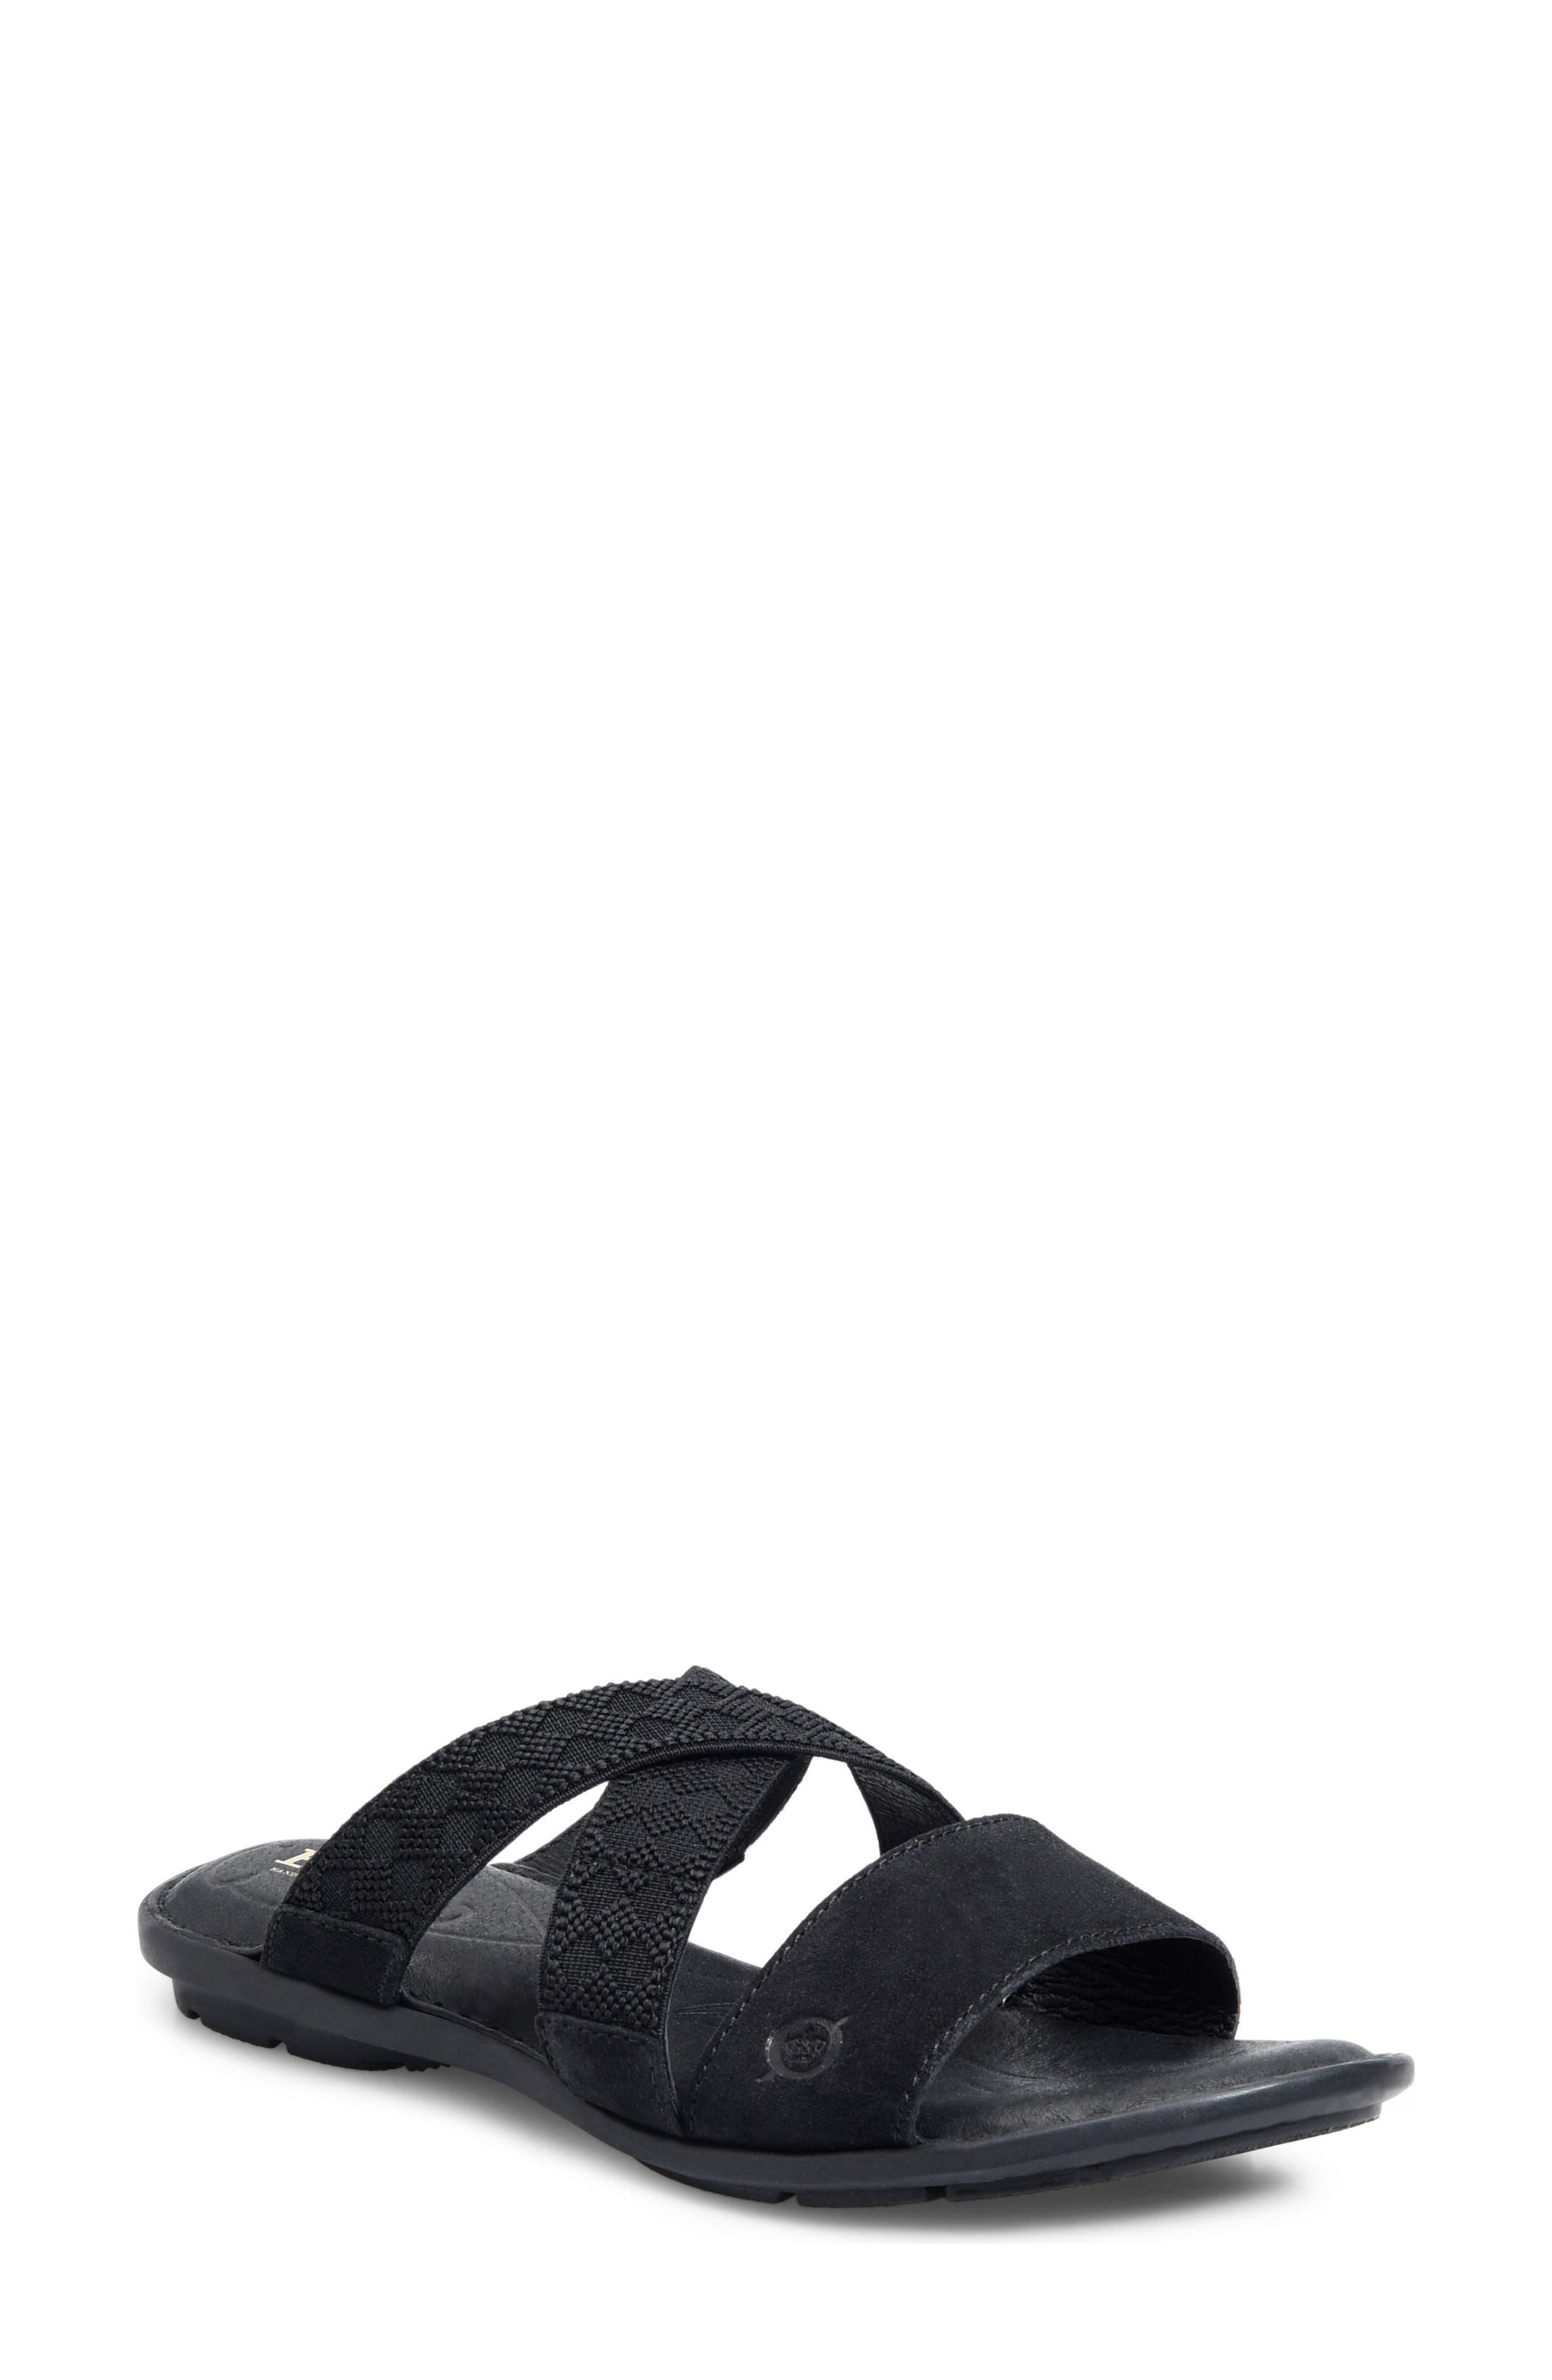 Tidore Slide Sandal,                         Main,                         color,